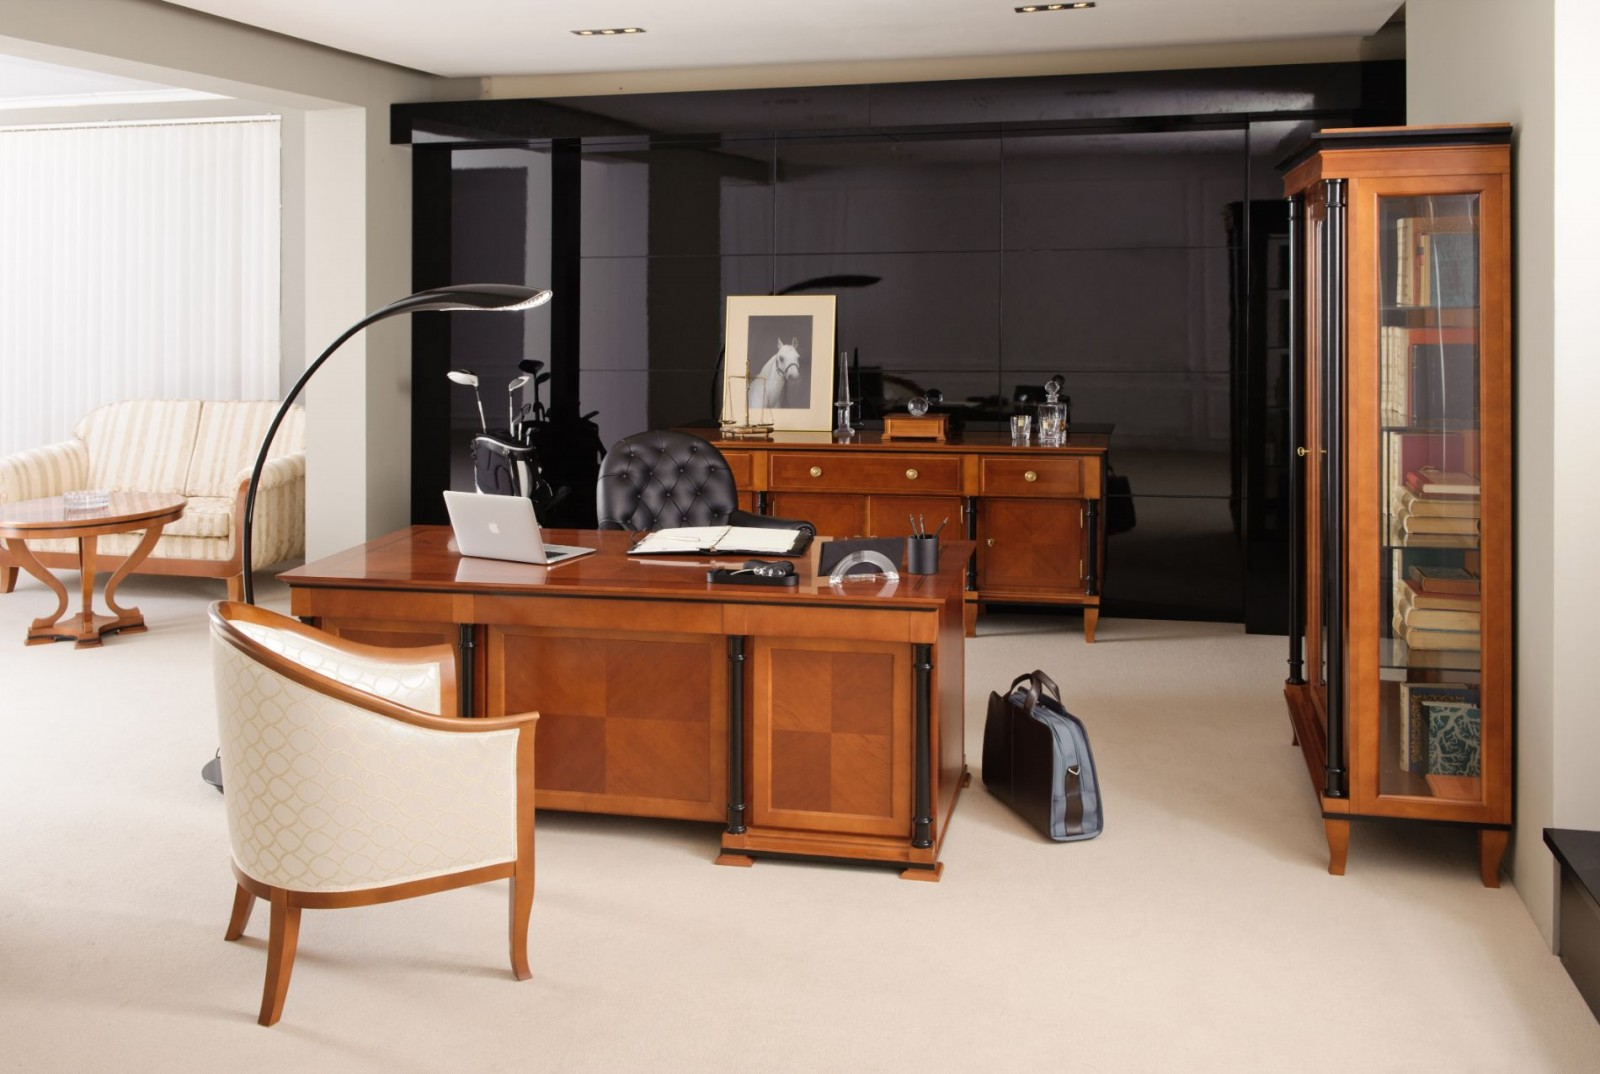 pisarna_office_Bidermajer_klasicno-pohistvo_classic-furniture_Klassischen-Moebel_Biedermeier